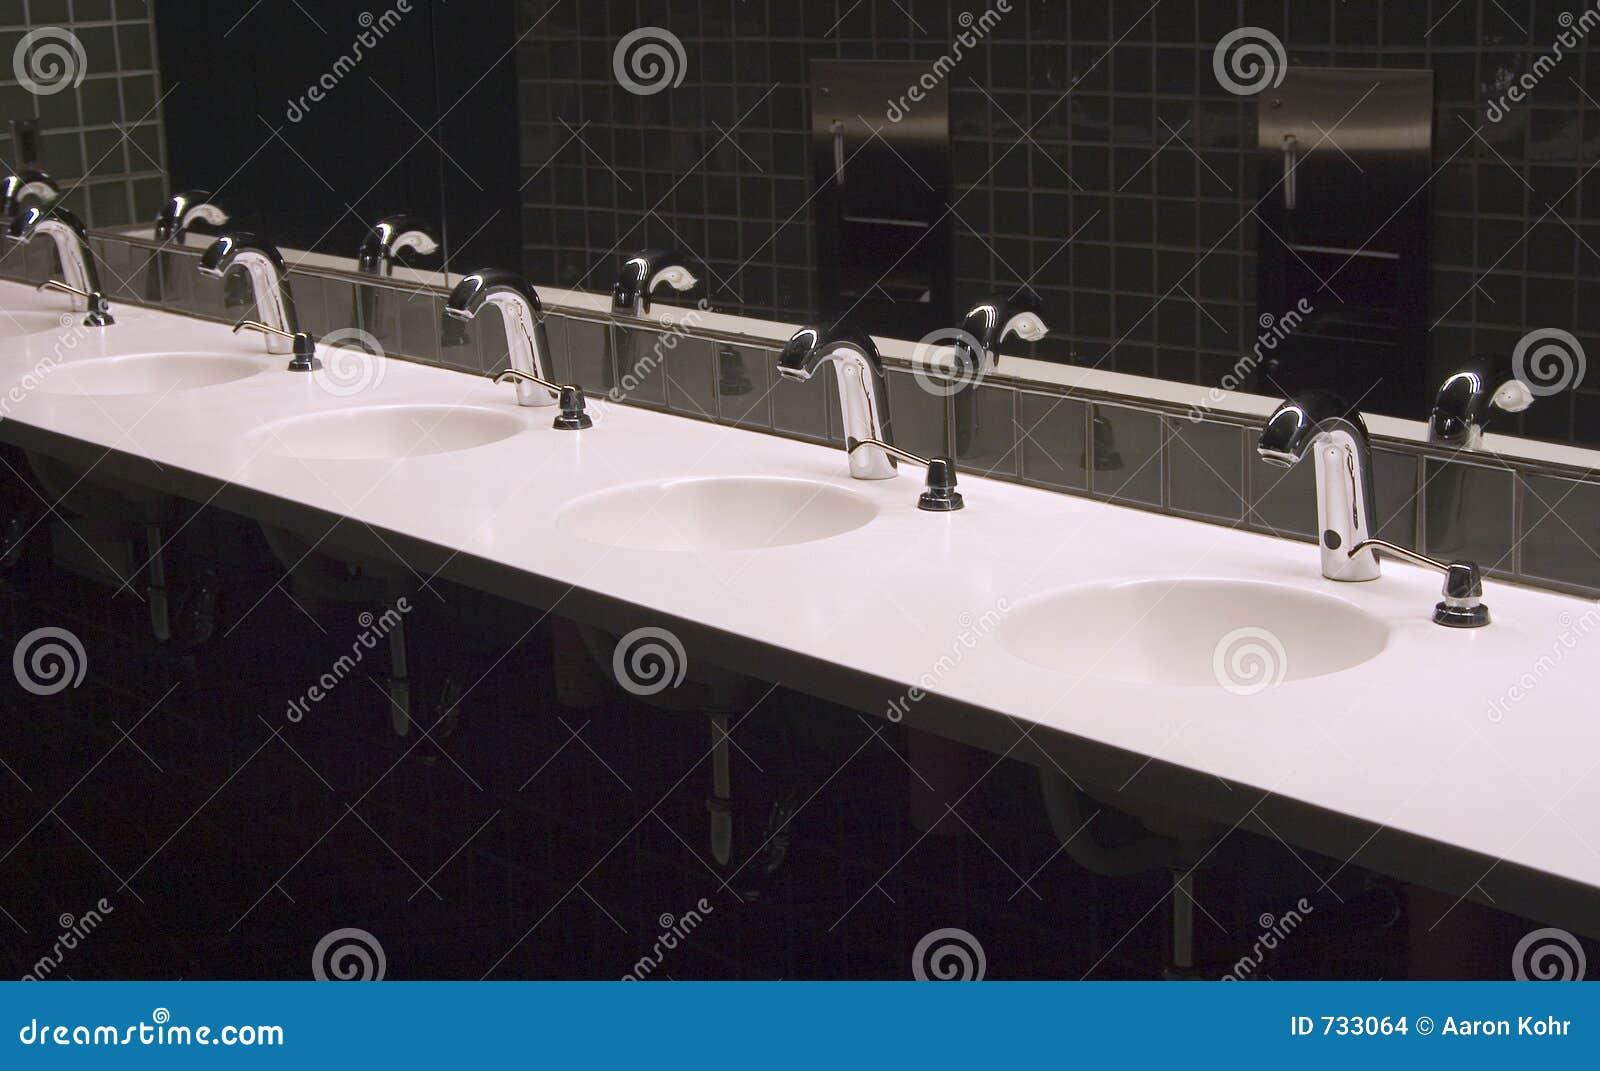 Public Bathroom Sink : Bathroom Sinks 3 Stock Images - Image: 733064